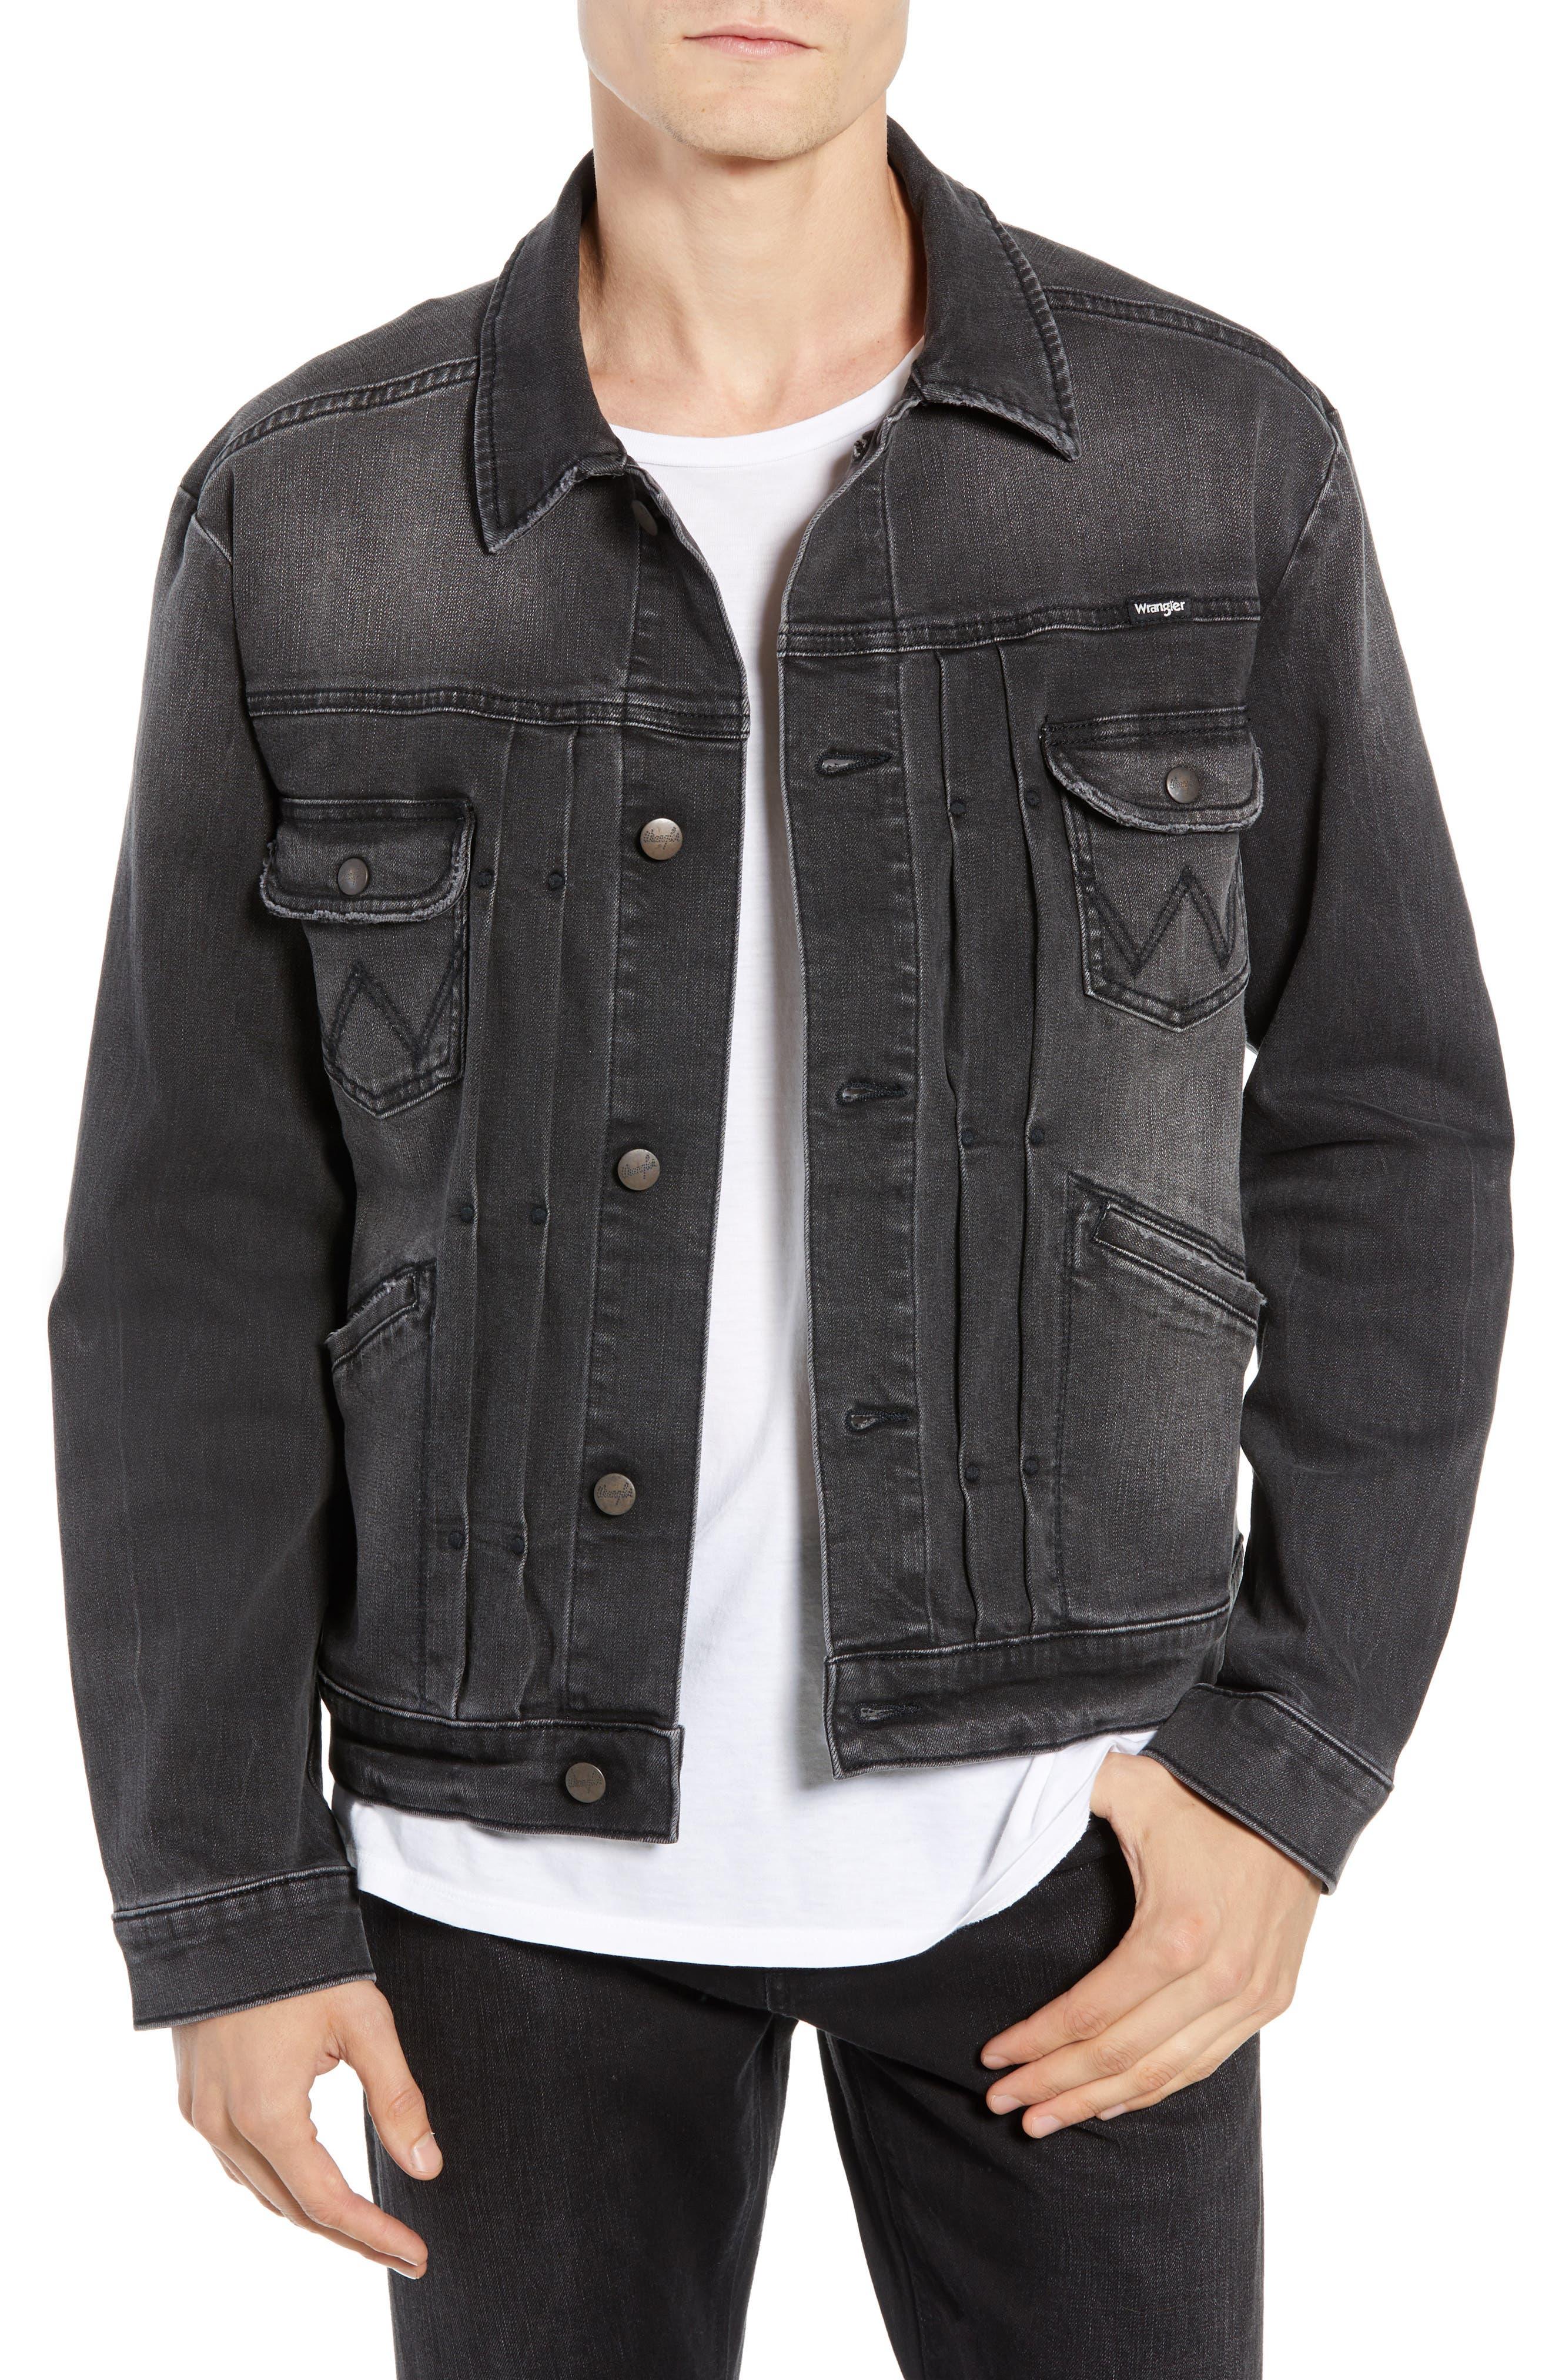 WRANGLER, Heritage Pleated Denim Jacket, Main thumbnail 1, color, 020